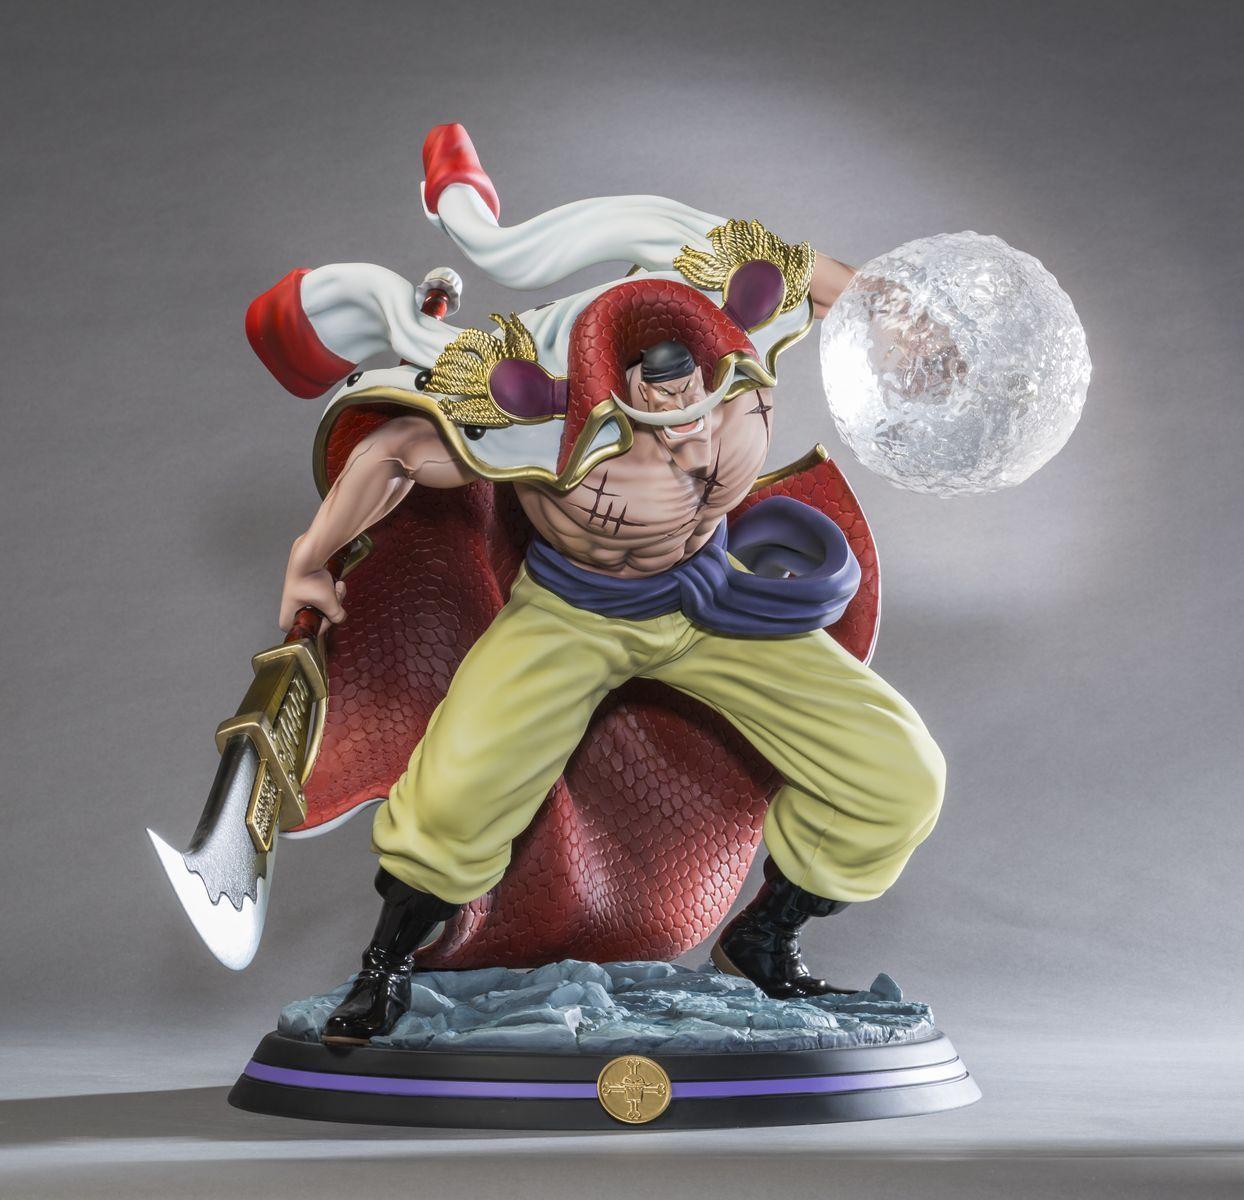 Tsume Art One Piece White Beard HQS Statue